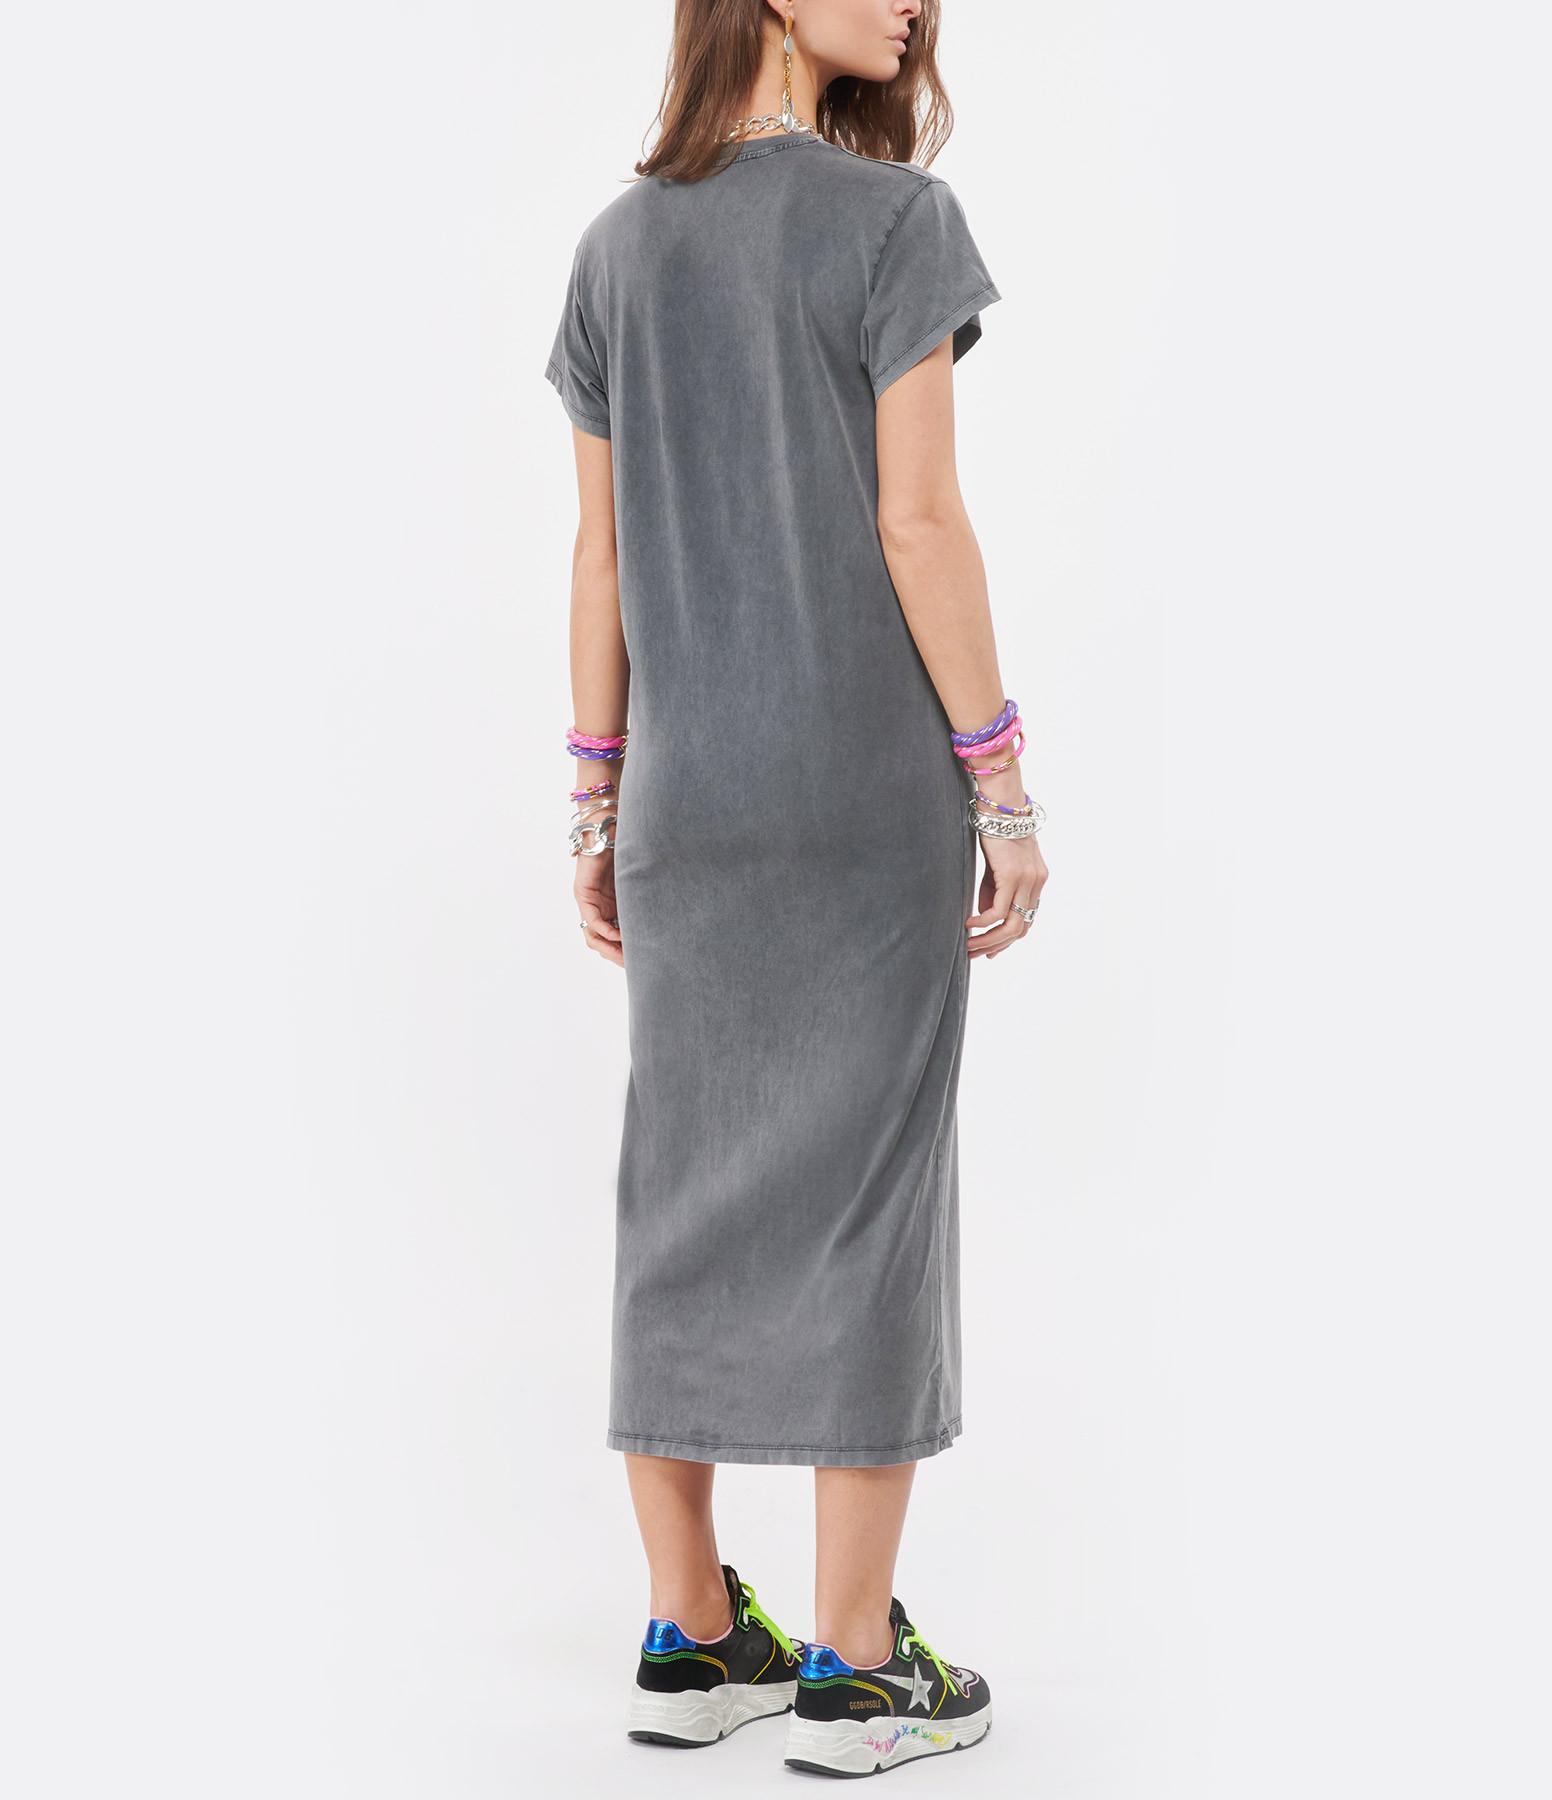 IRO - Robe Elisha Coton Gris